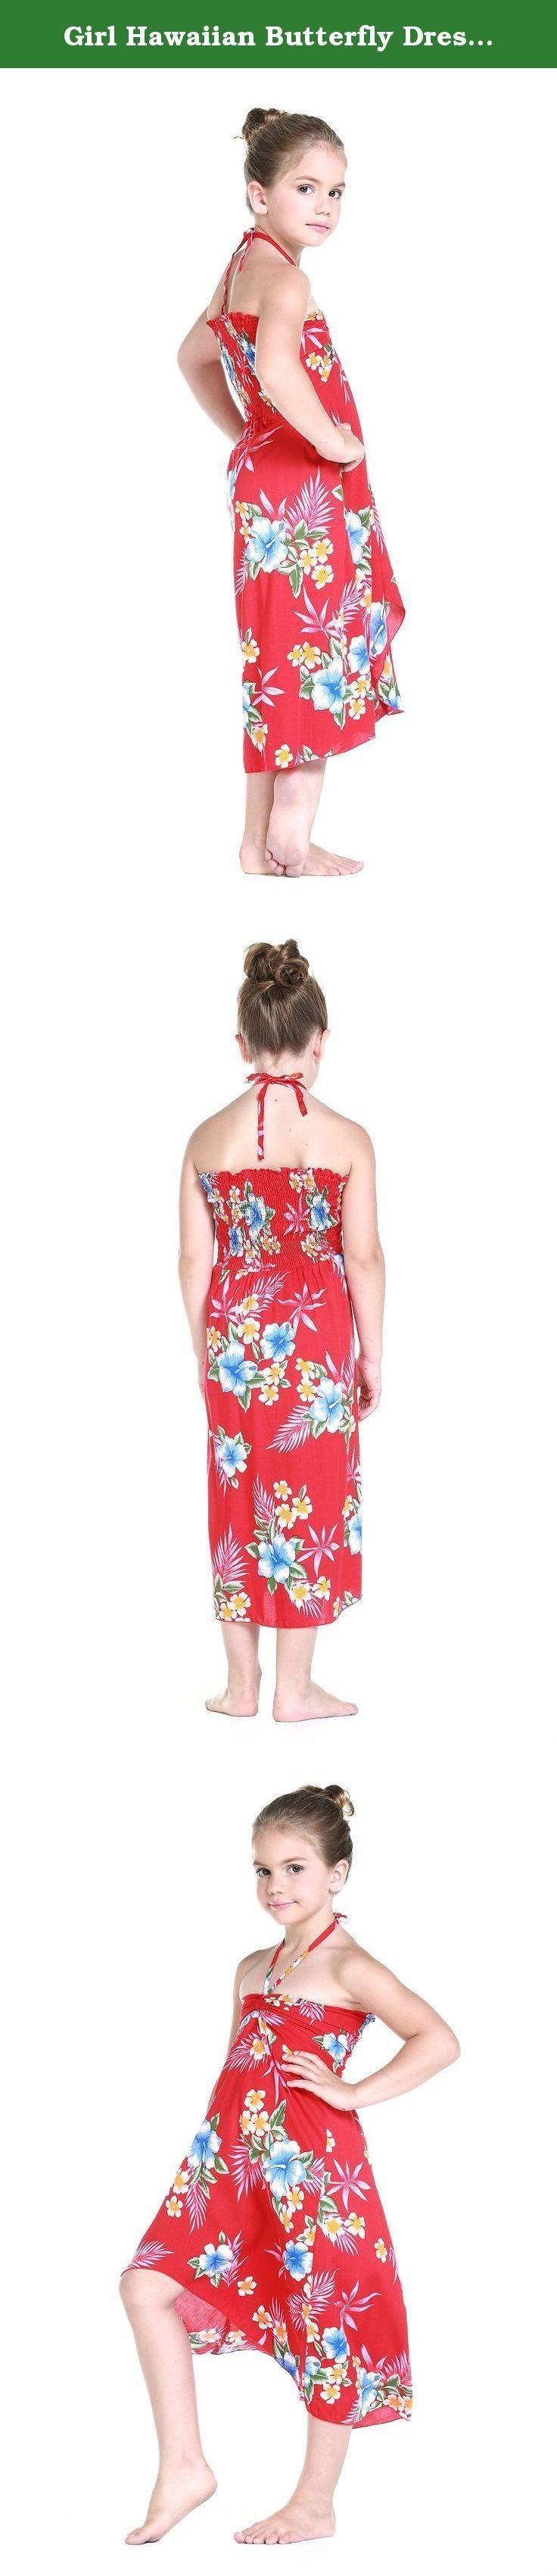 Cocktail dress for 50th birthday luau